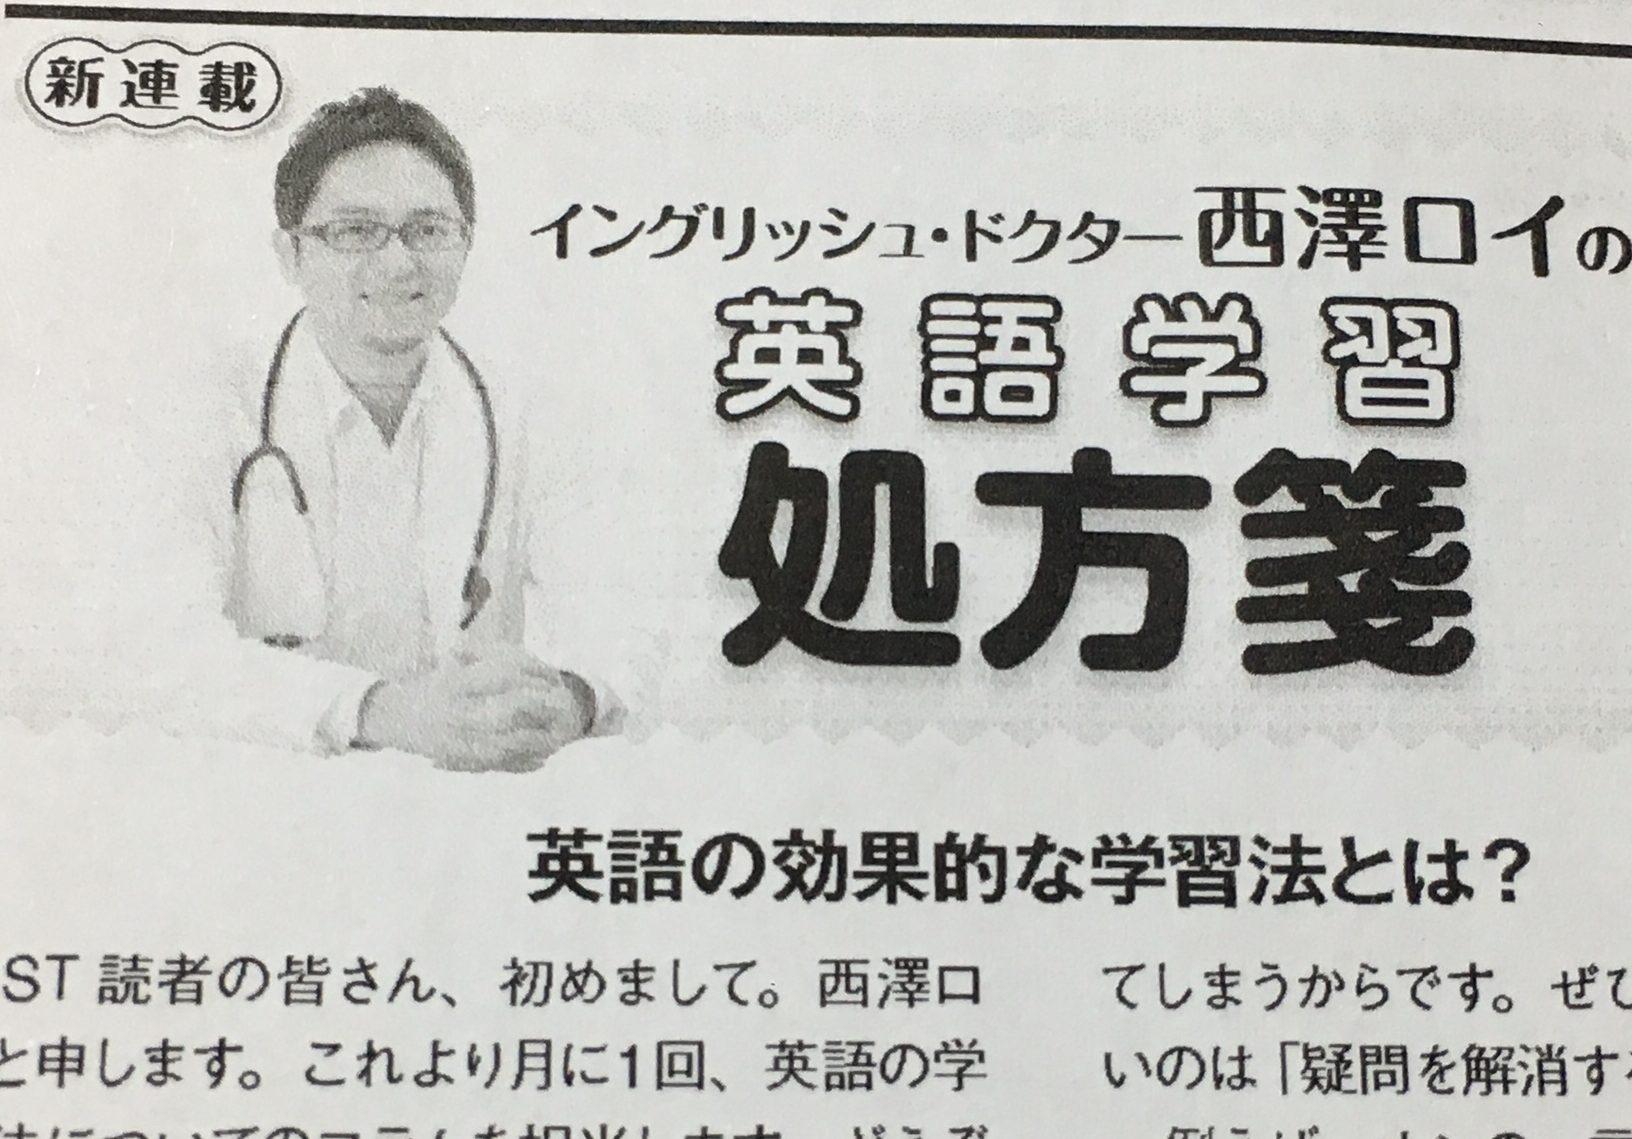 「The Japan Times ST」紙での連載スタート